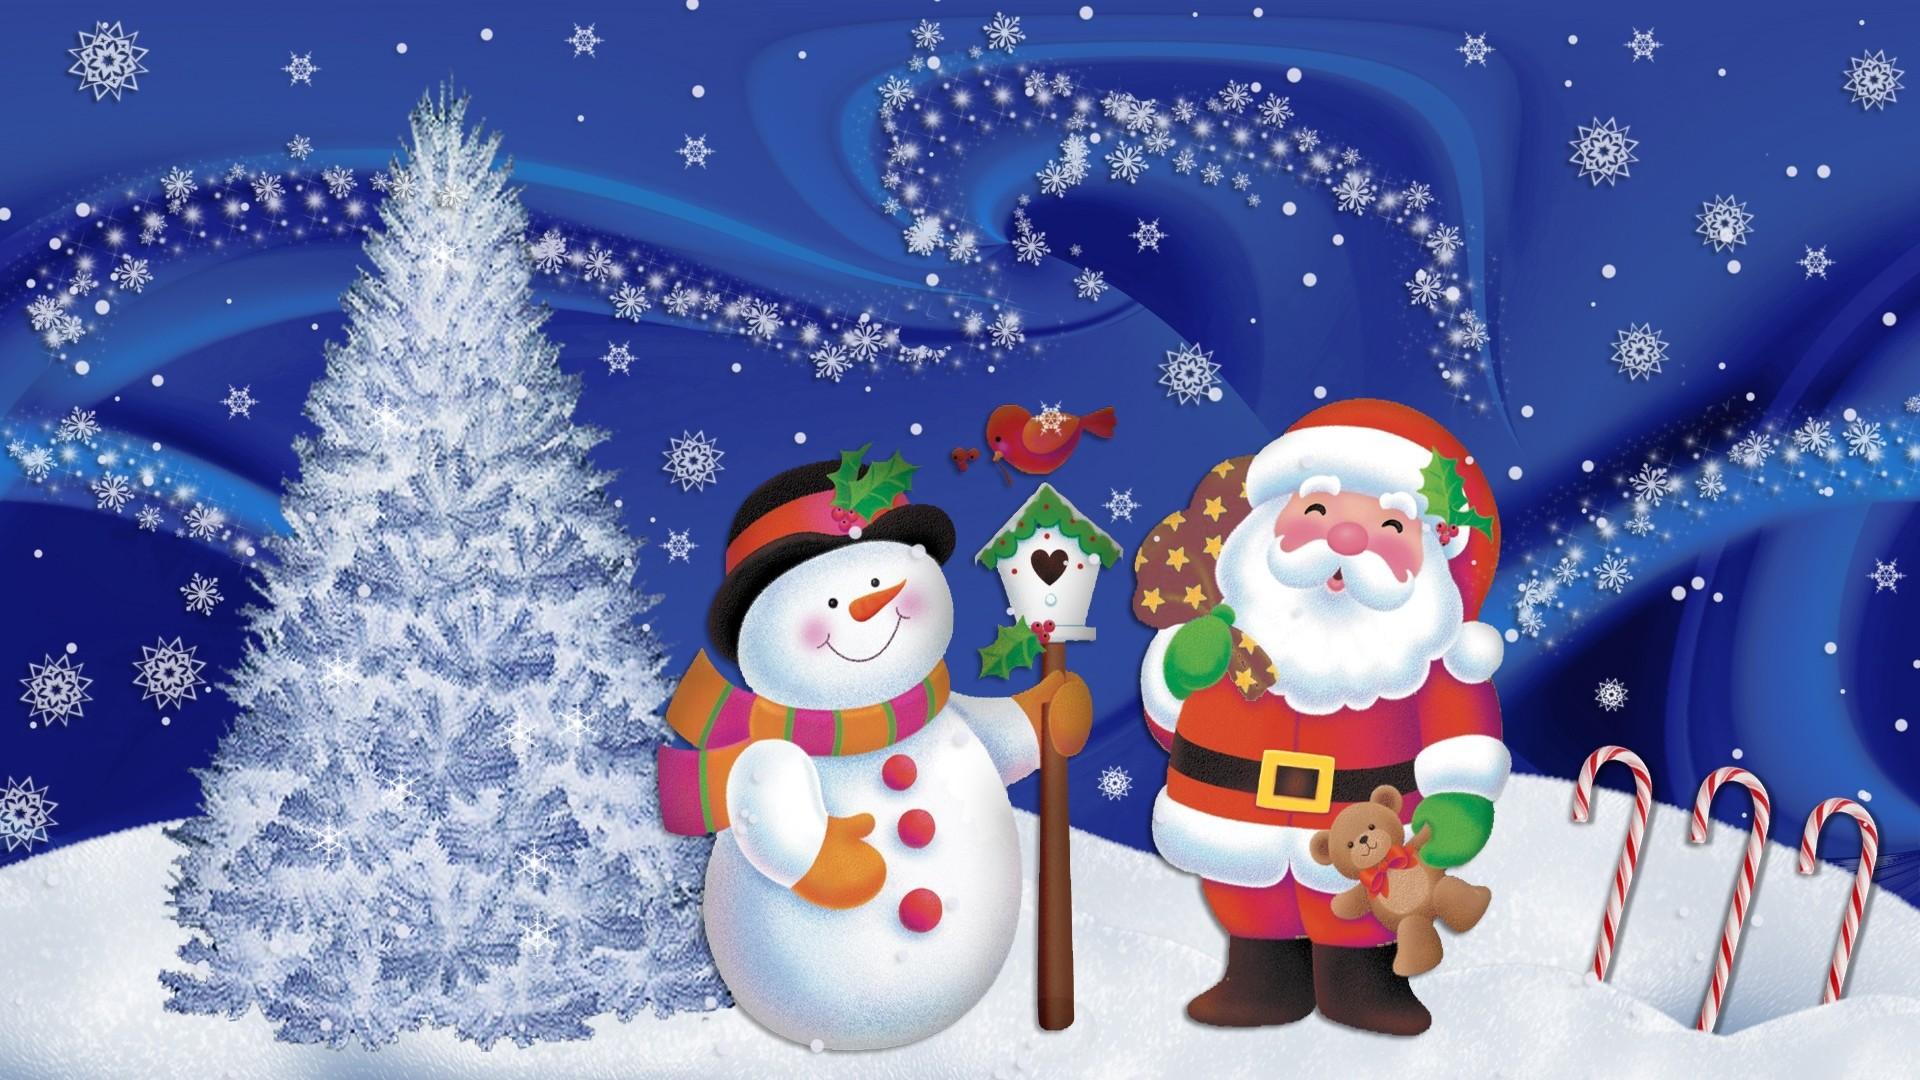 Merry Christmas wallpaper – 809191